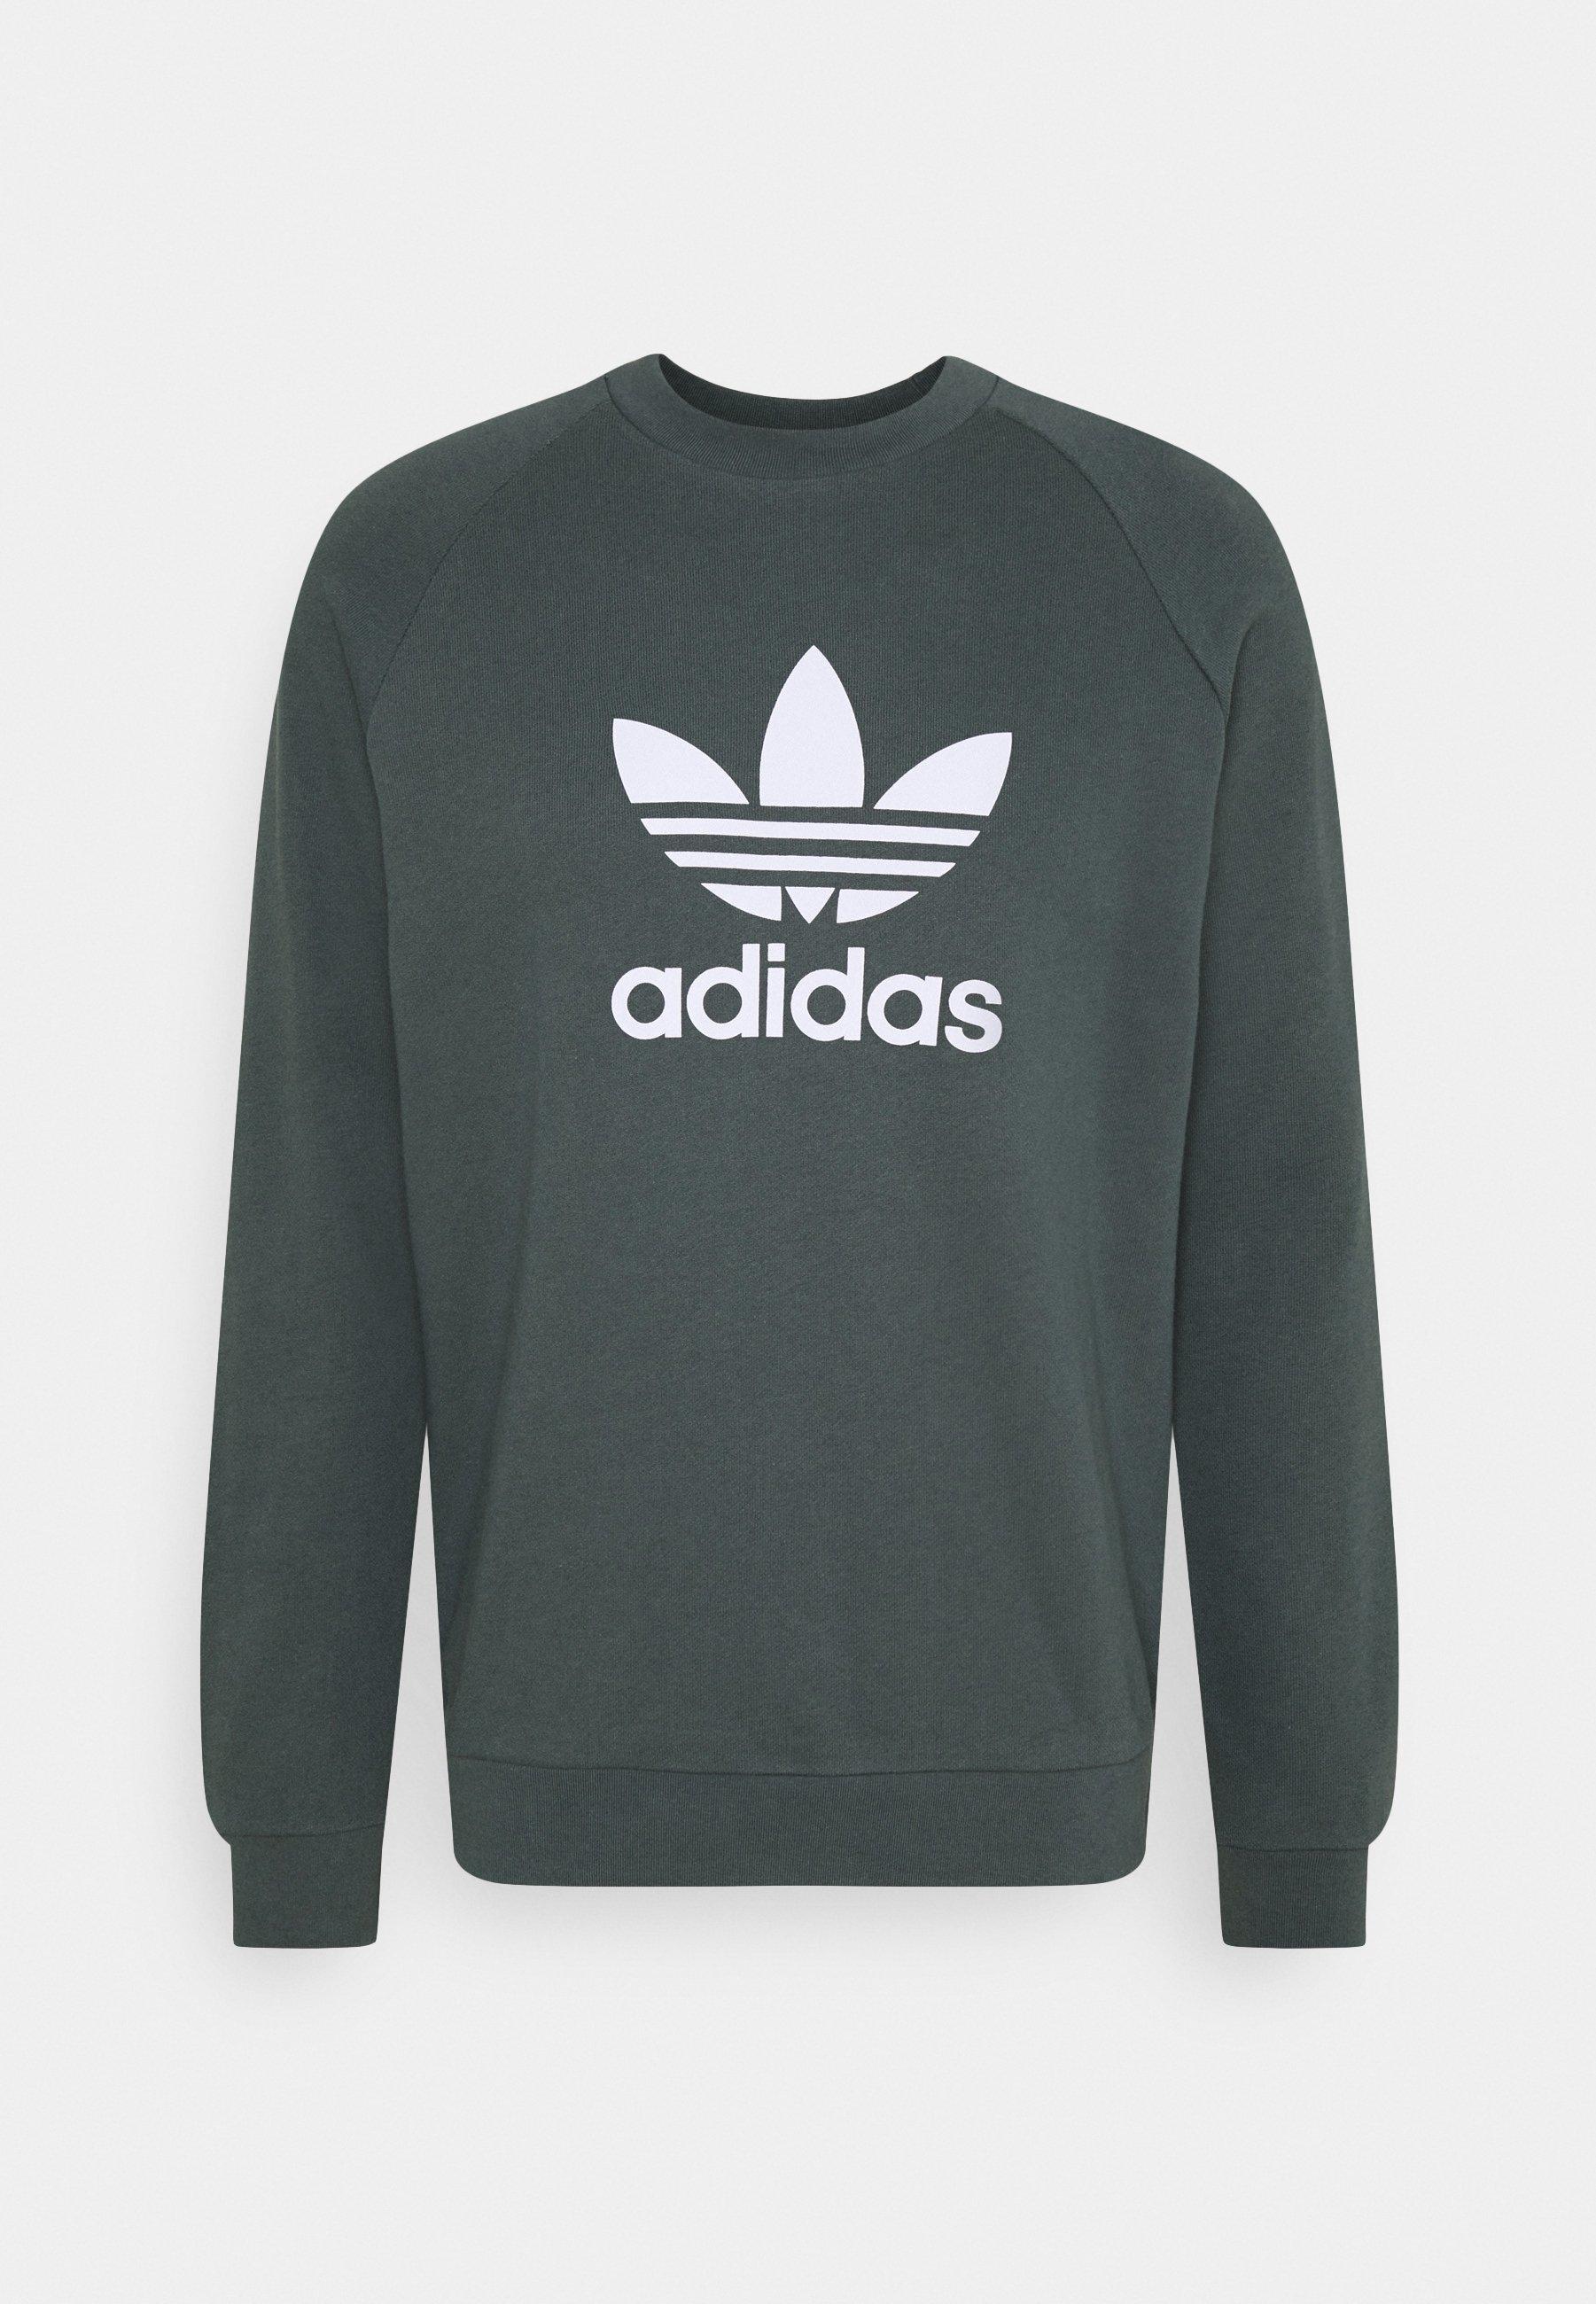 vóleibol realce Caramelo  adidas Originals TREFOIL CREW UNISEX - Sweatshirt - bluoxi/light blue -  Zalando.co.uk